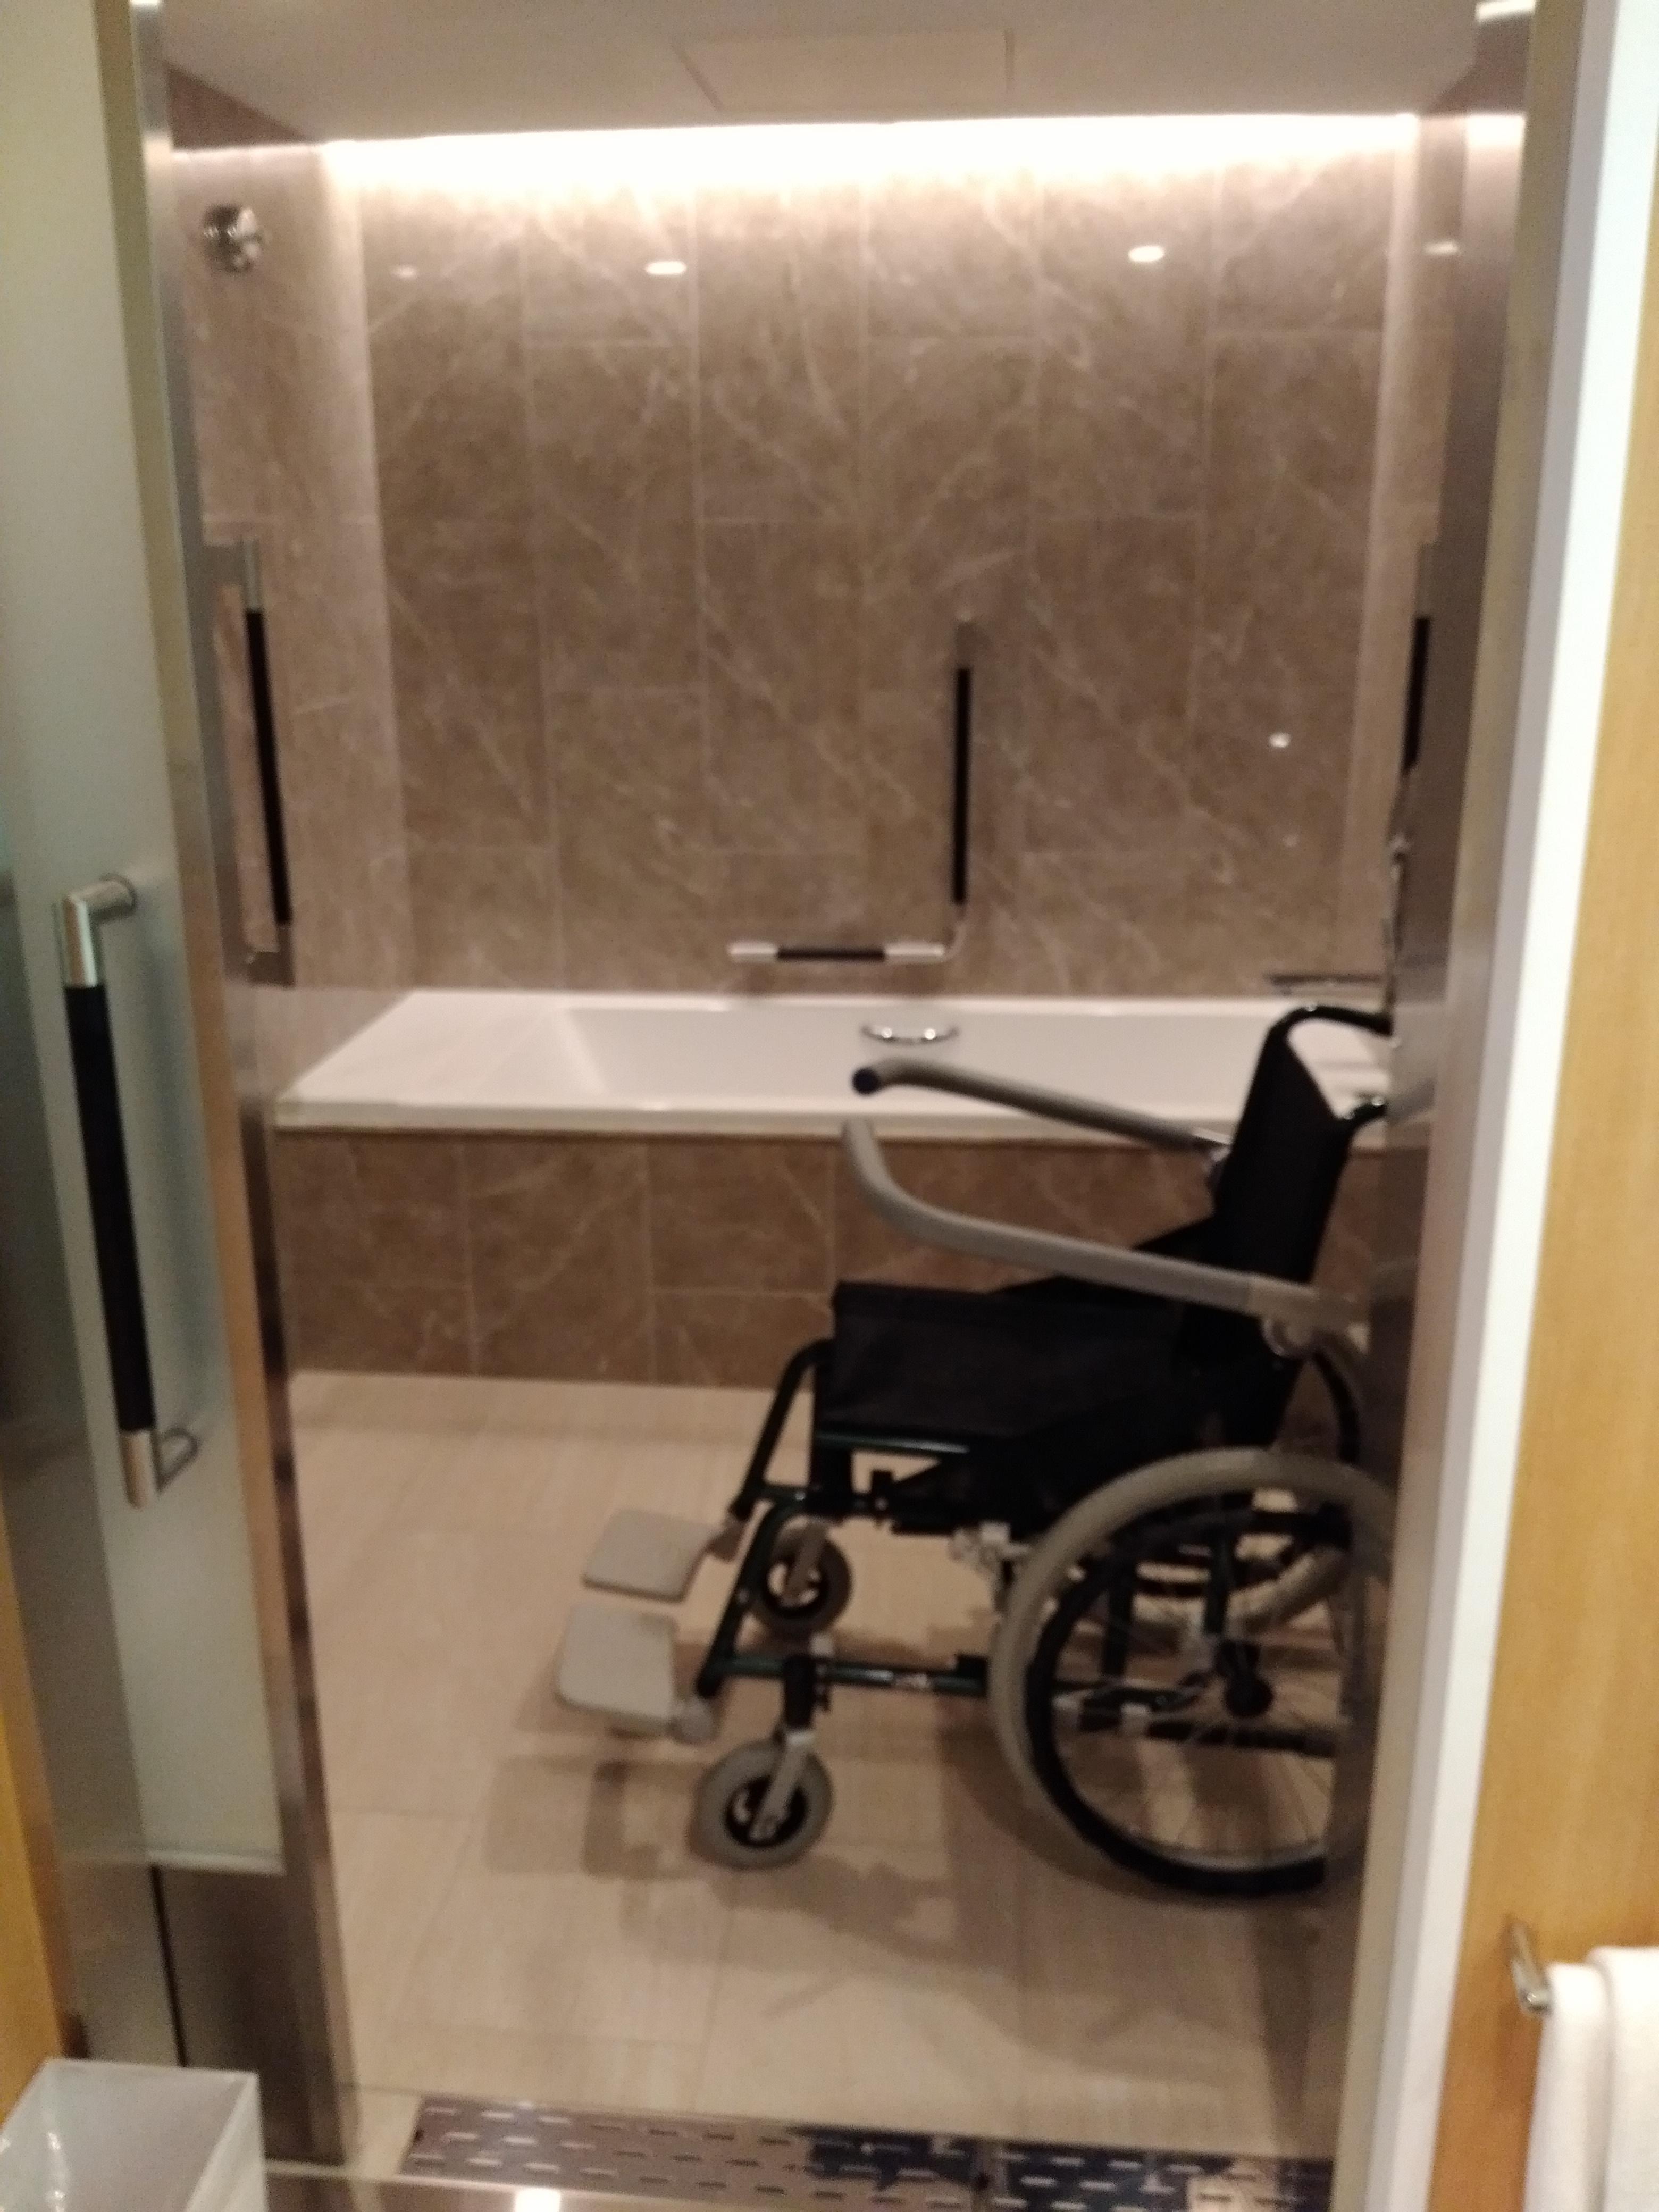 Taking a Bath in a Wheelchair - Keio Plaza Hotel, Shinjuku, Tokyo